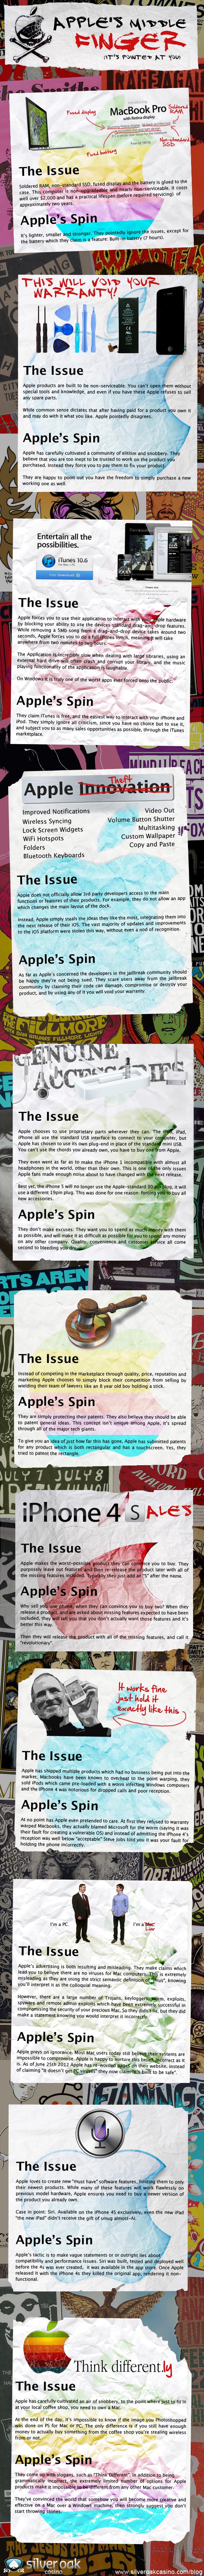 Apple add Apple Add 2013